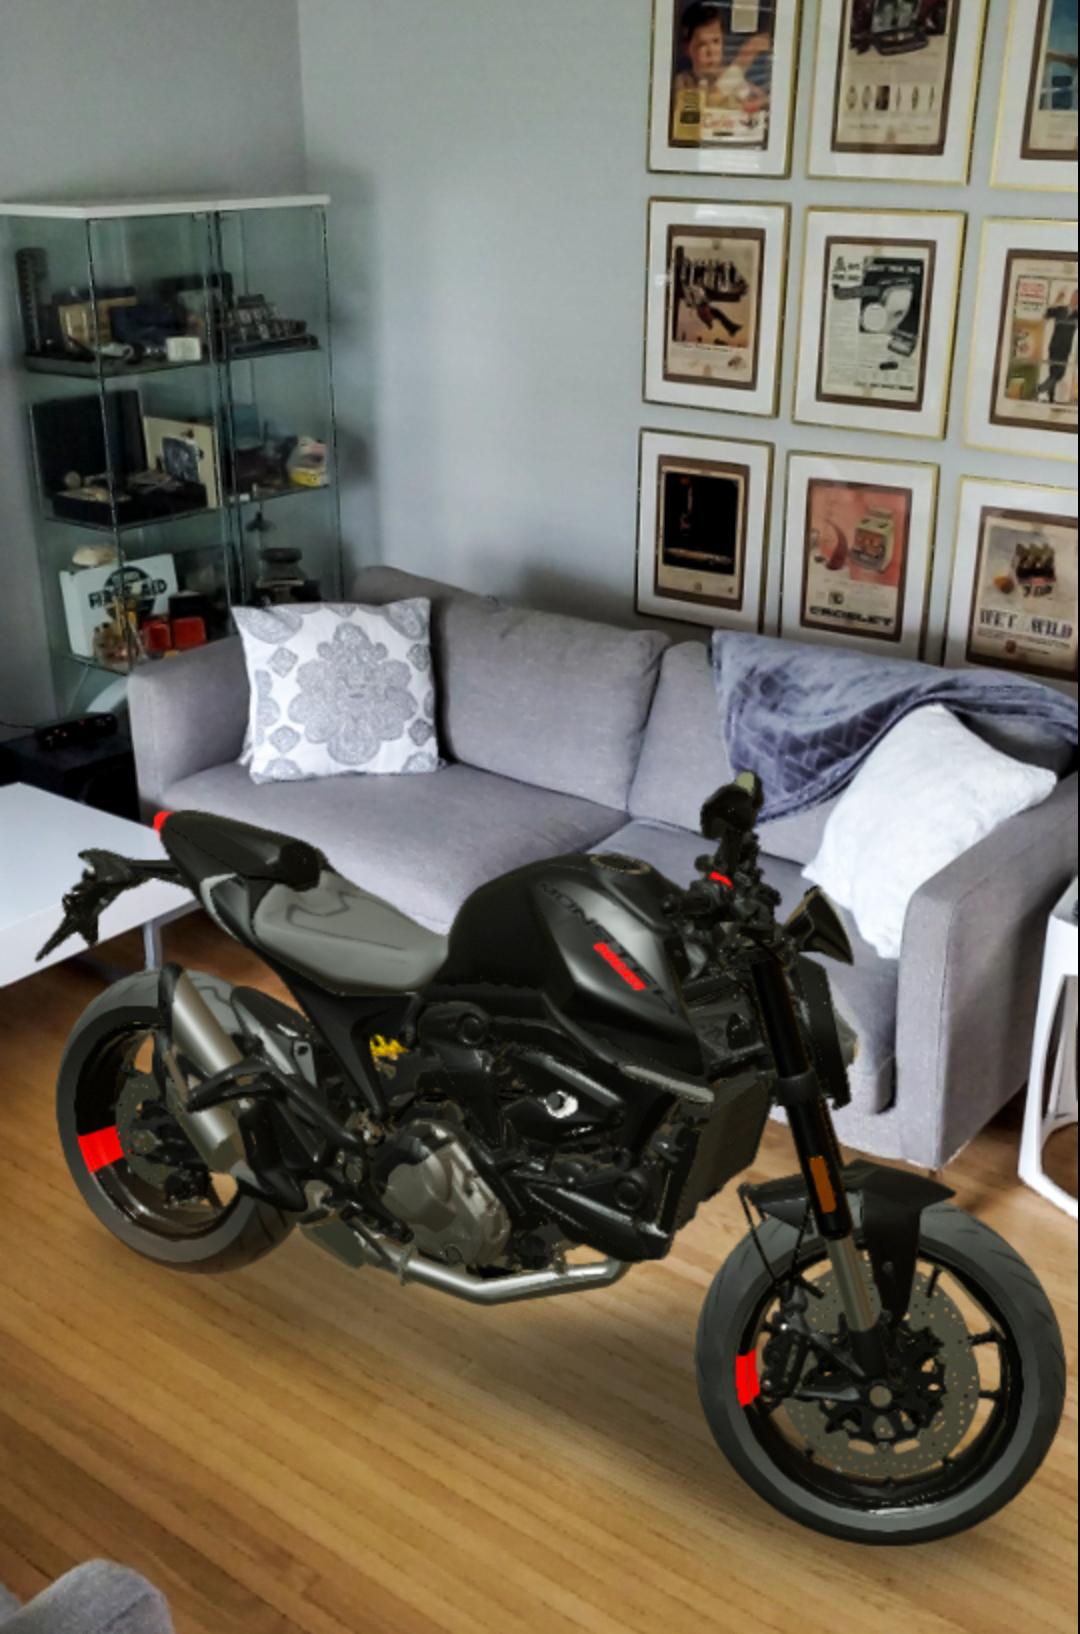 Ducati Hosting Photo Contest: Winner Will Get a Free Ducati